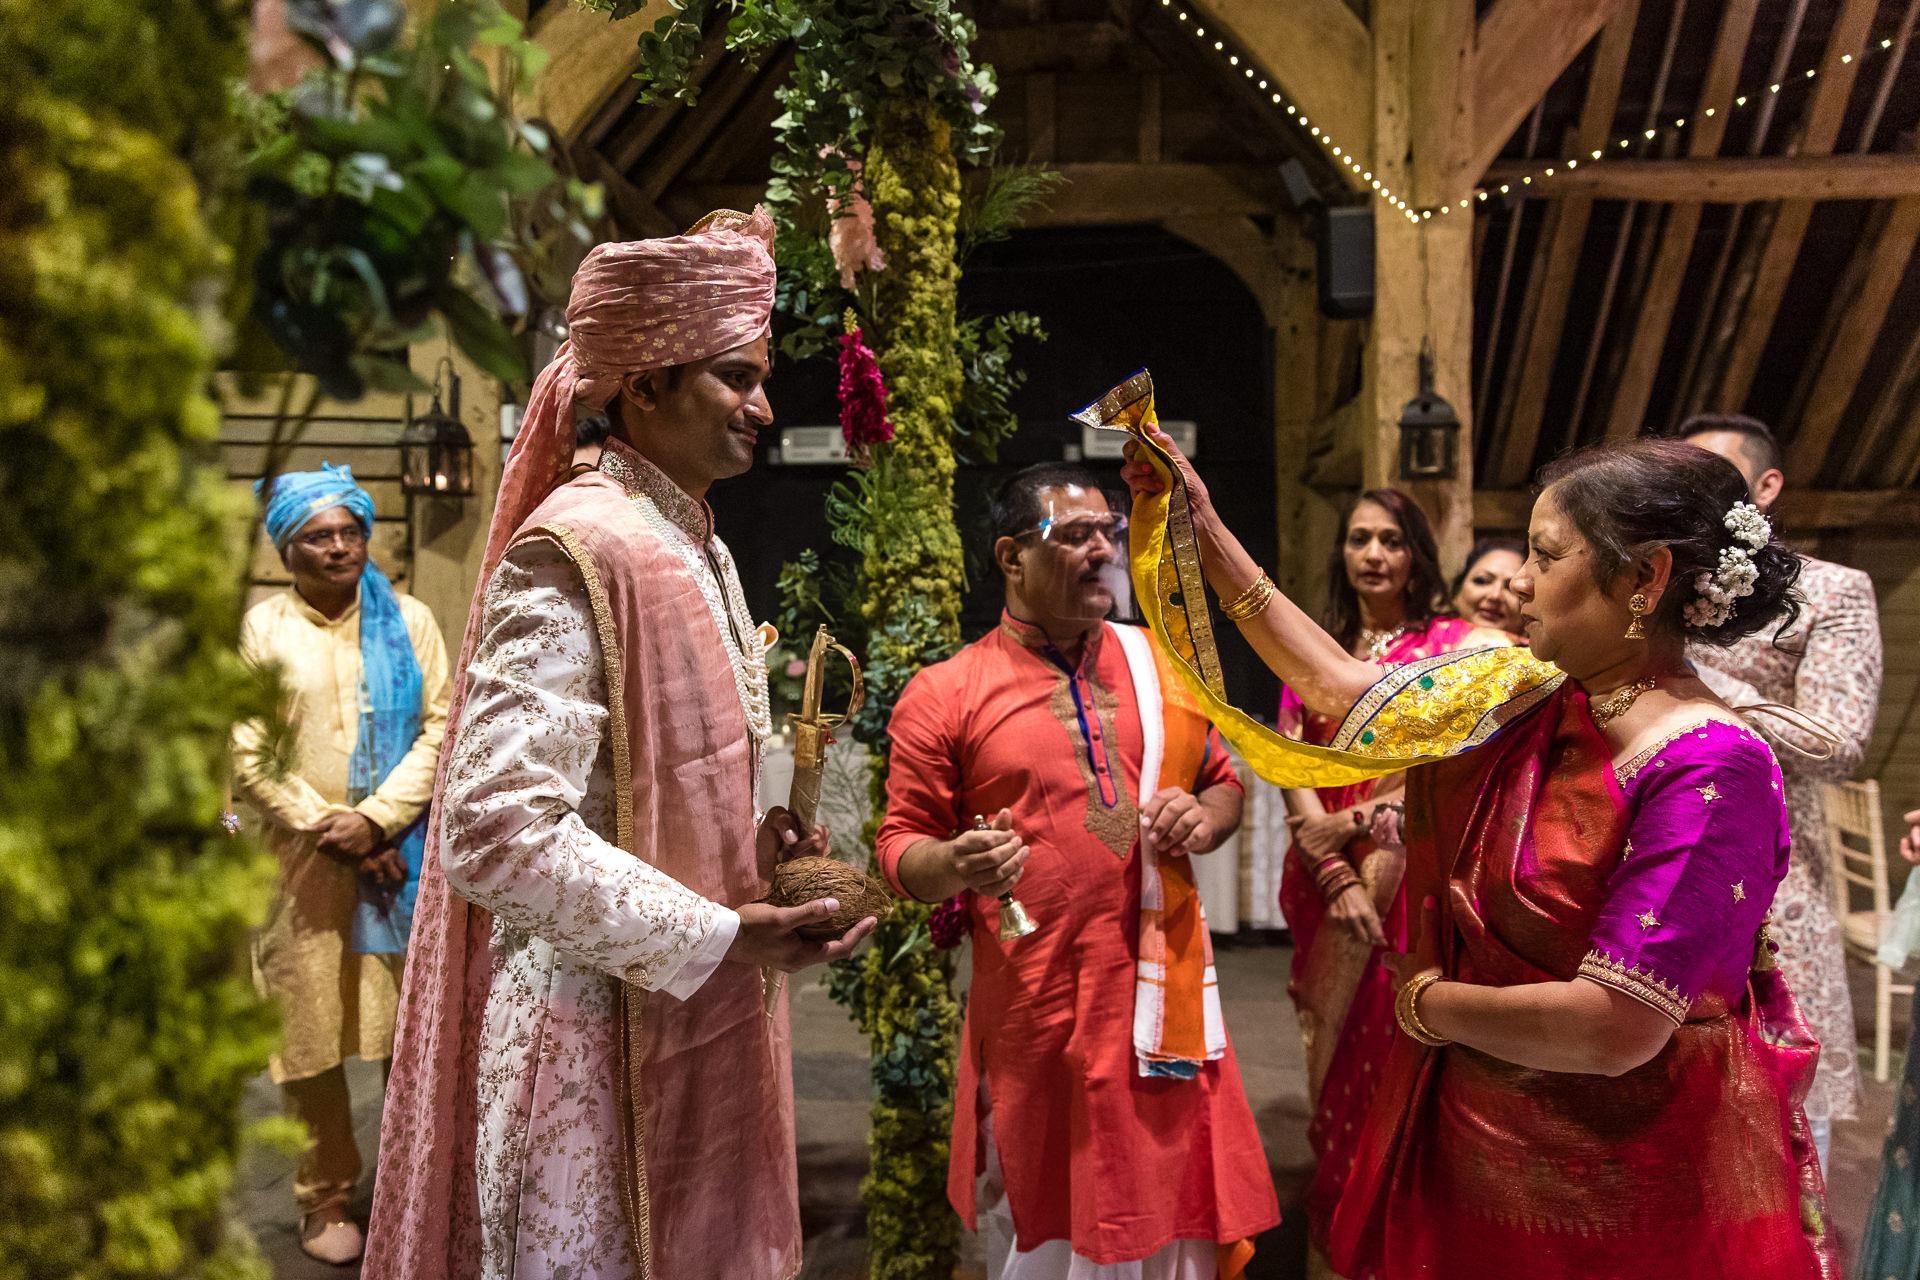 Gujarati wedding welcoming ceremony